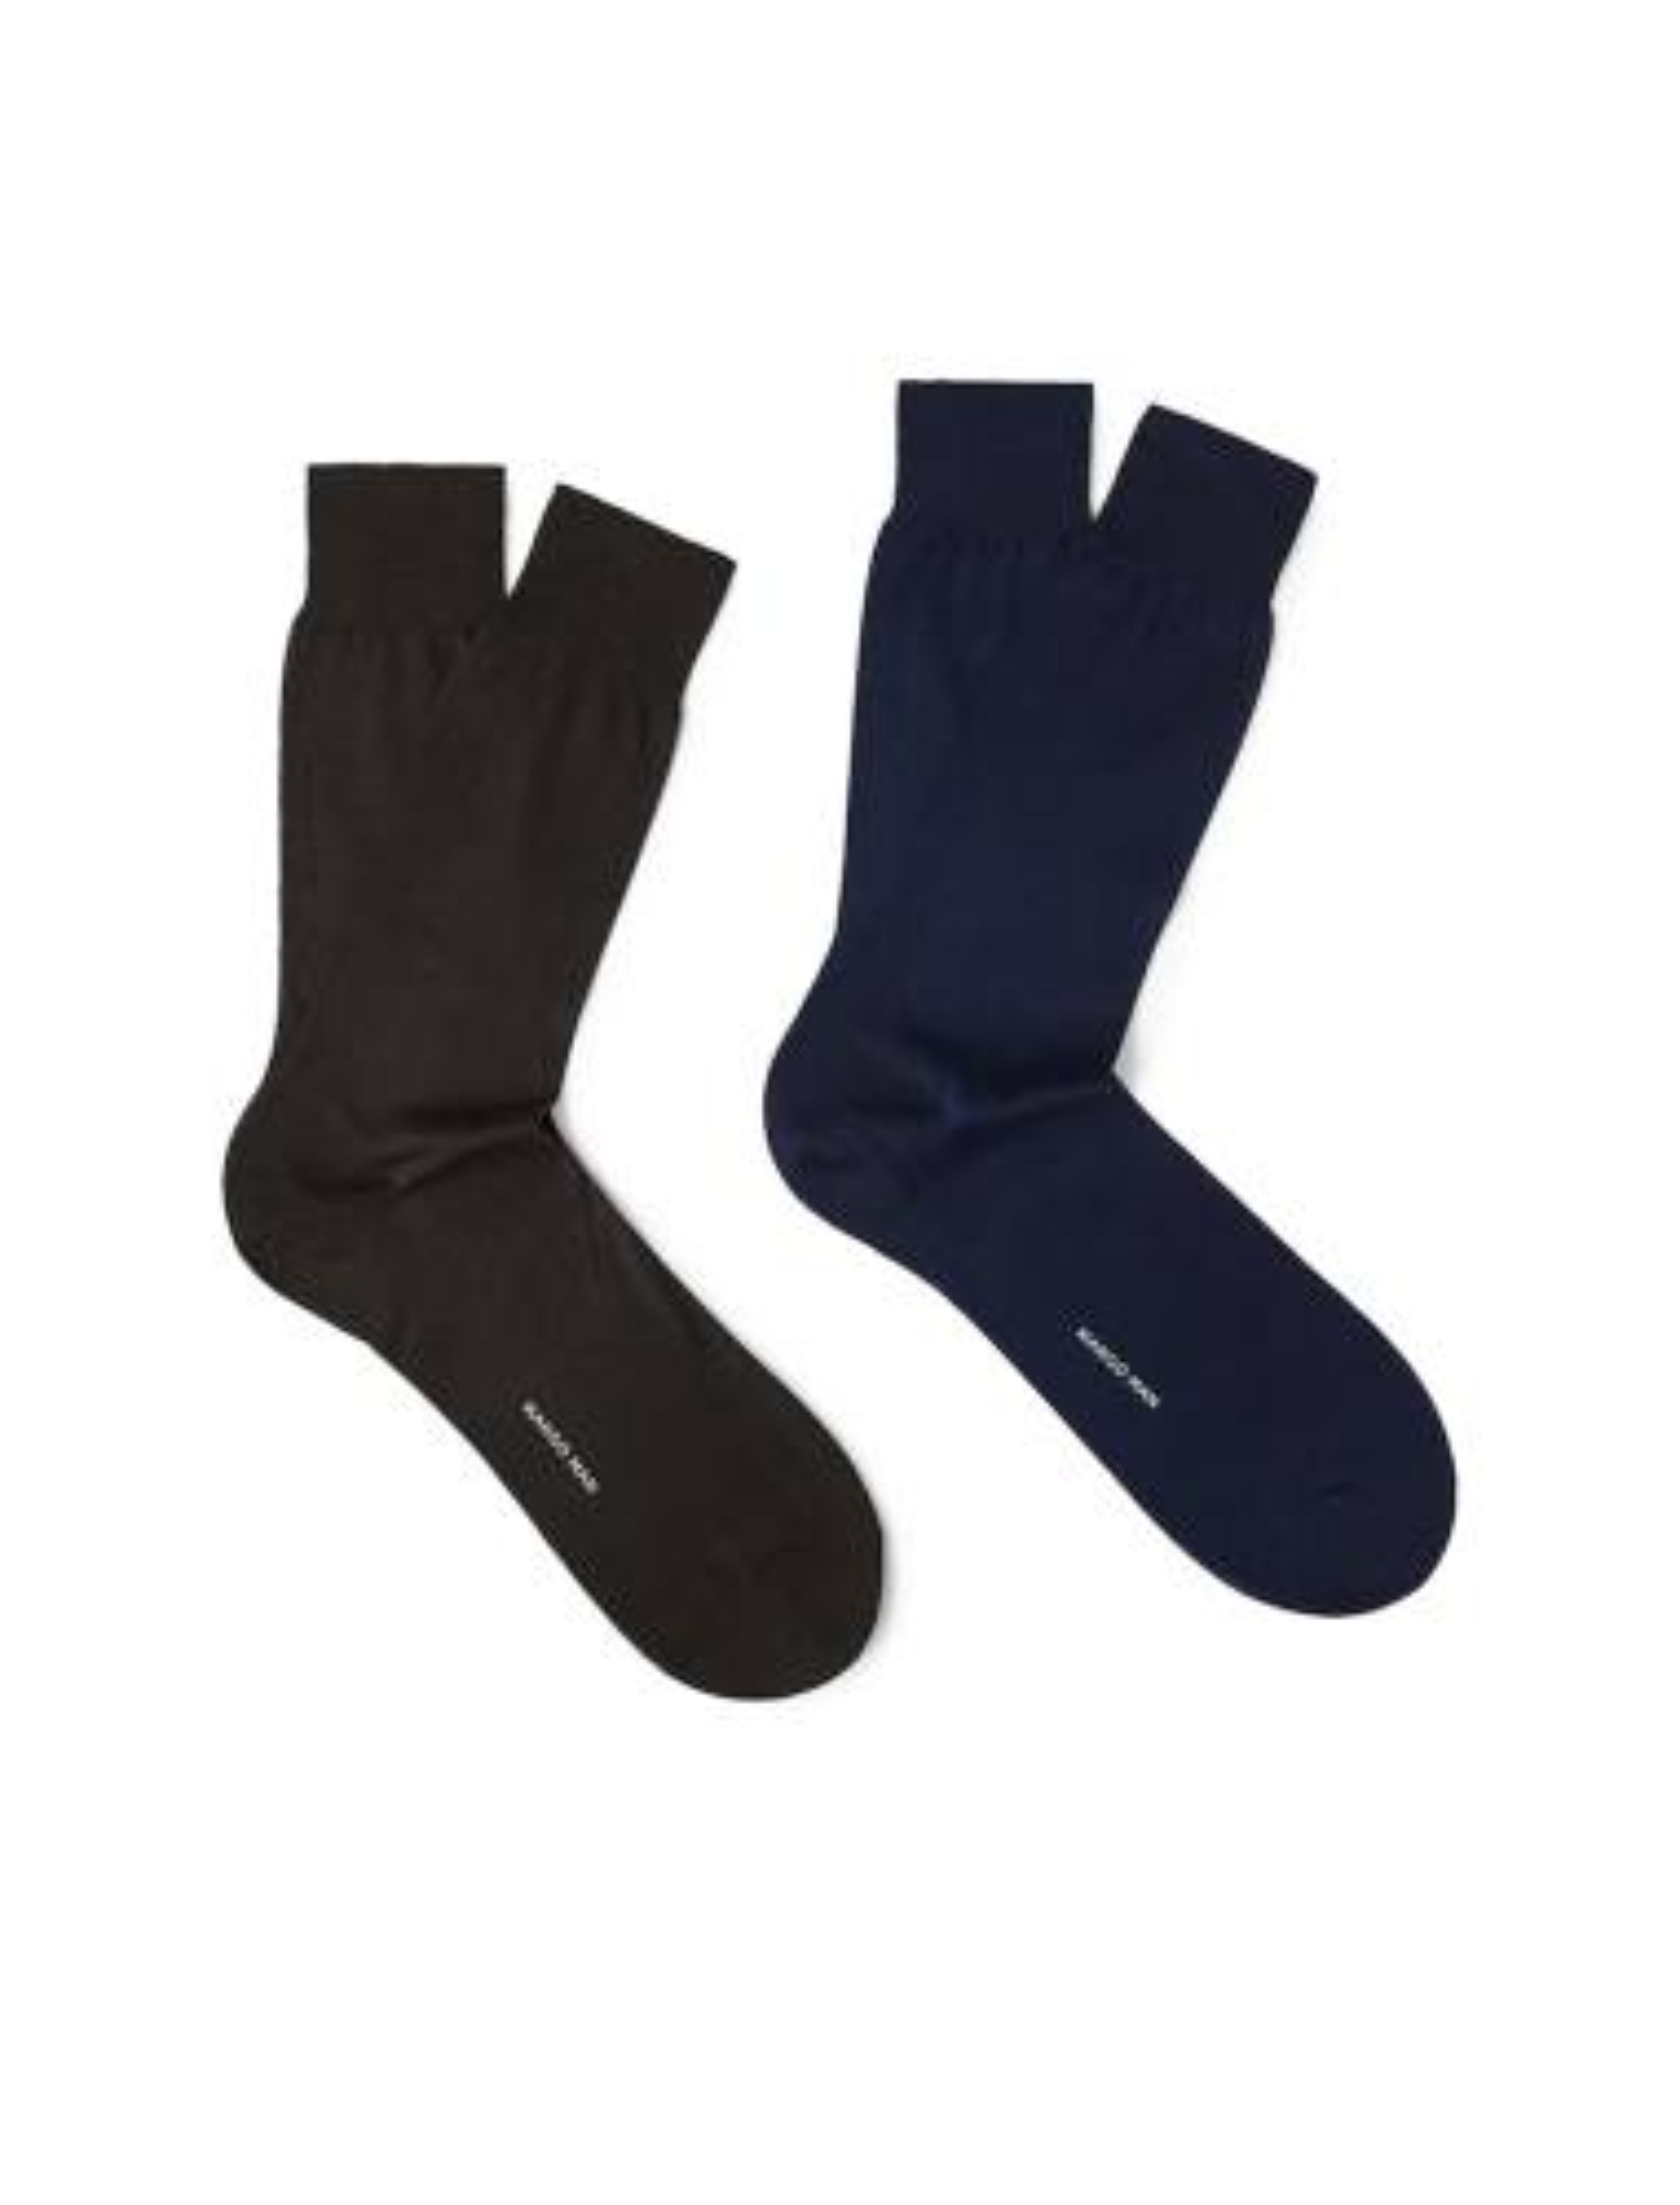 جوراب نخی ساق متوسط مردانه بسته 2 عددی - مانگو